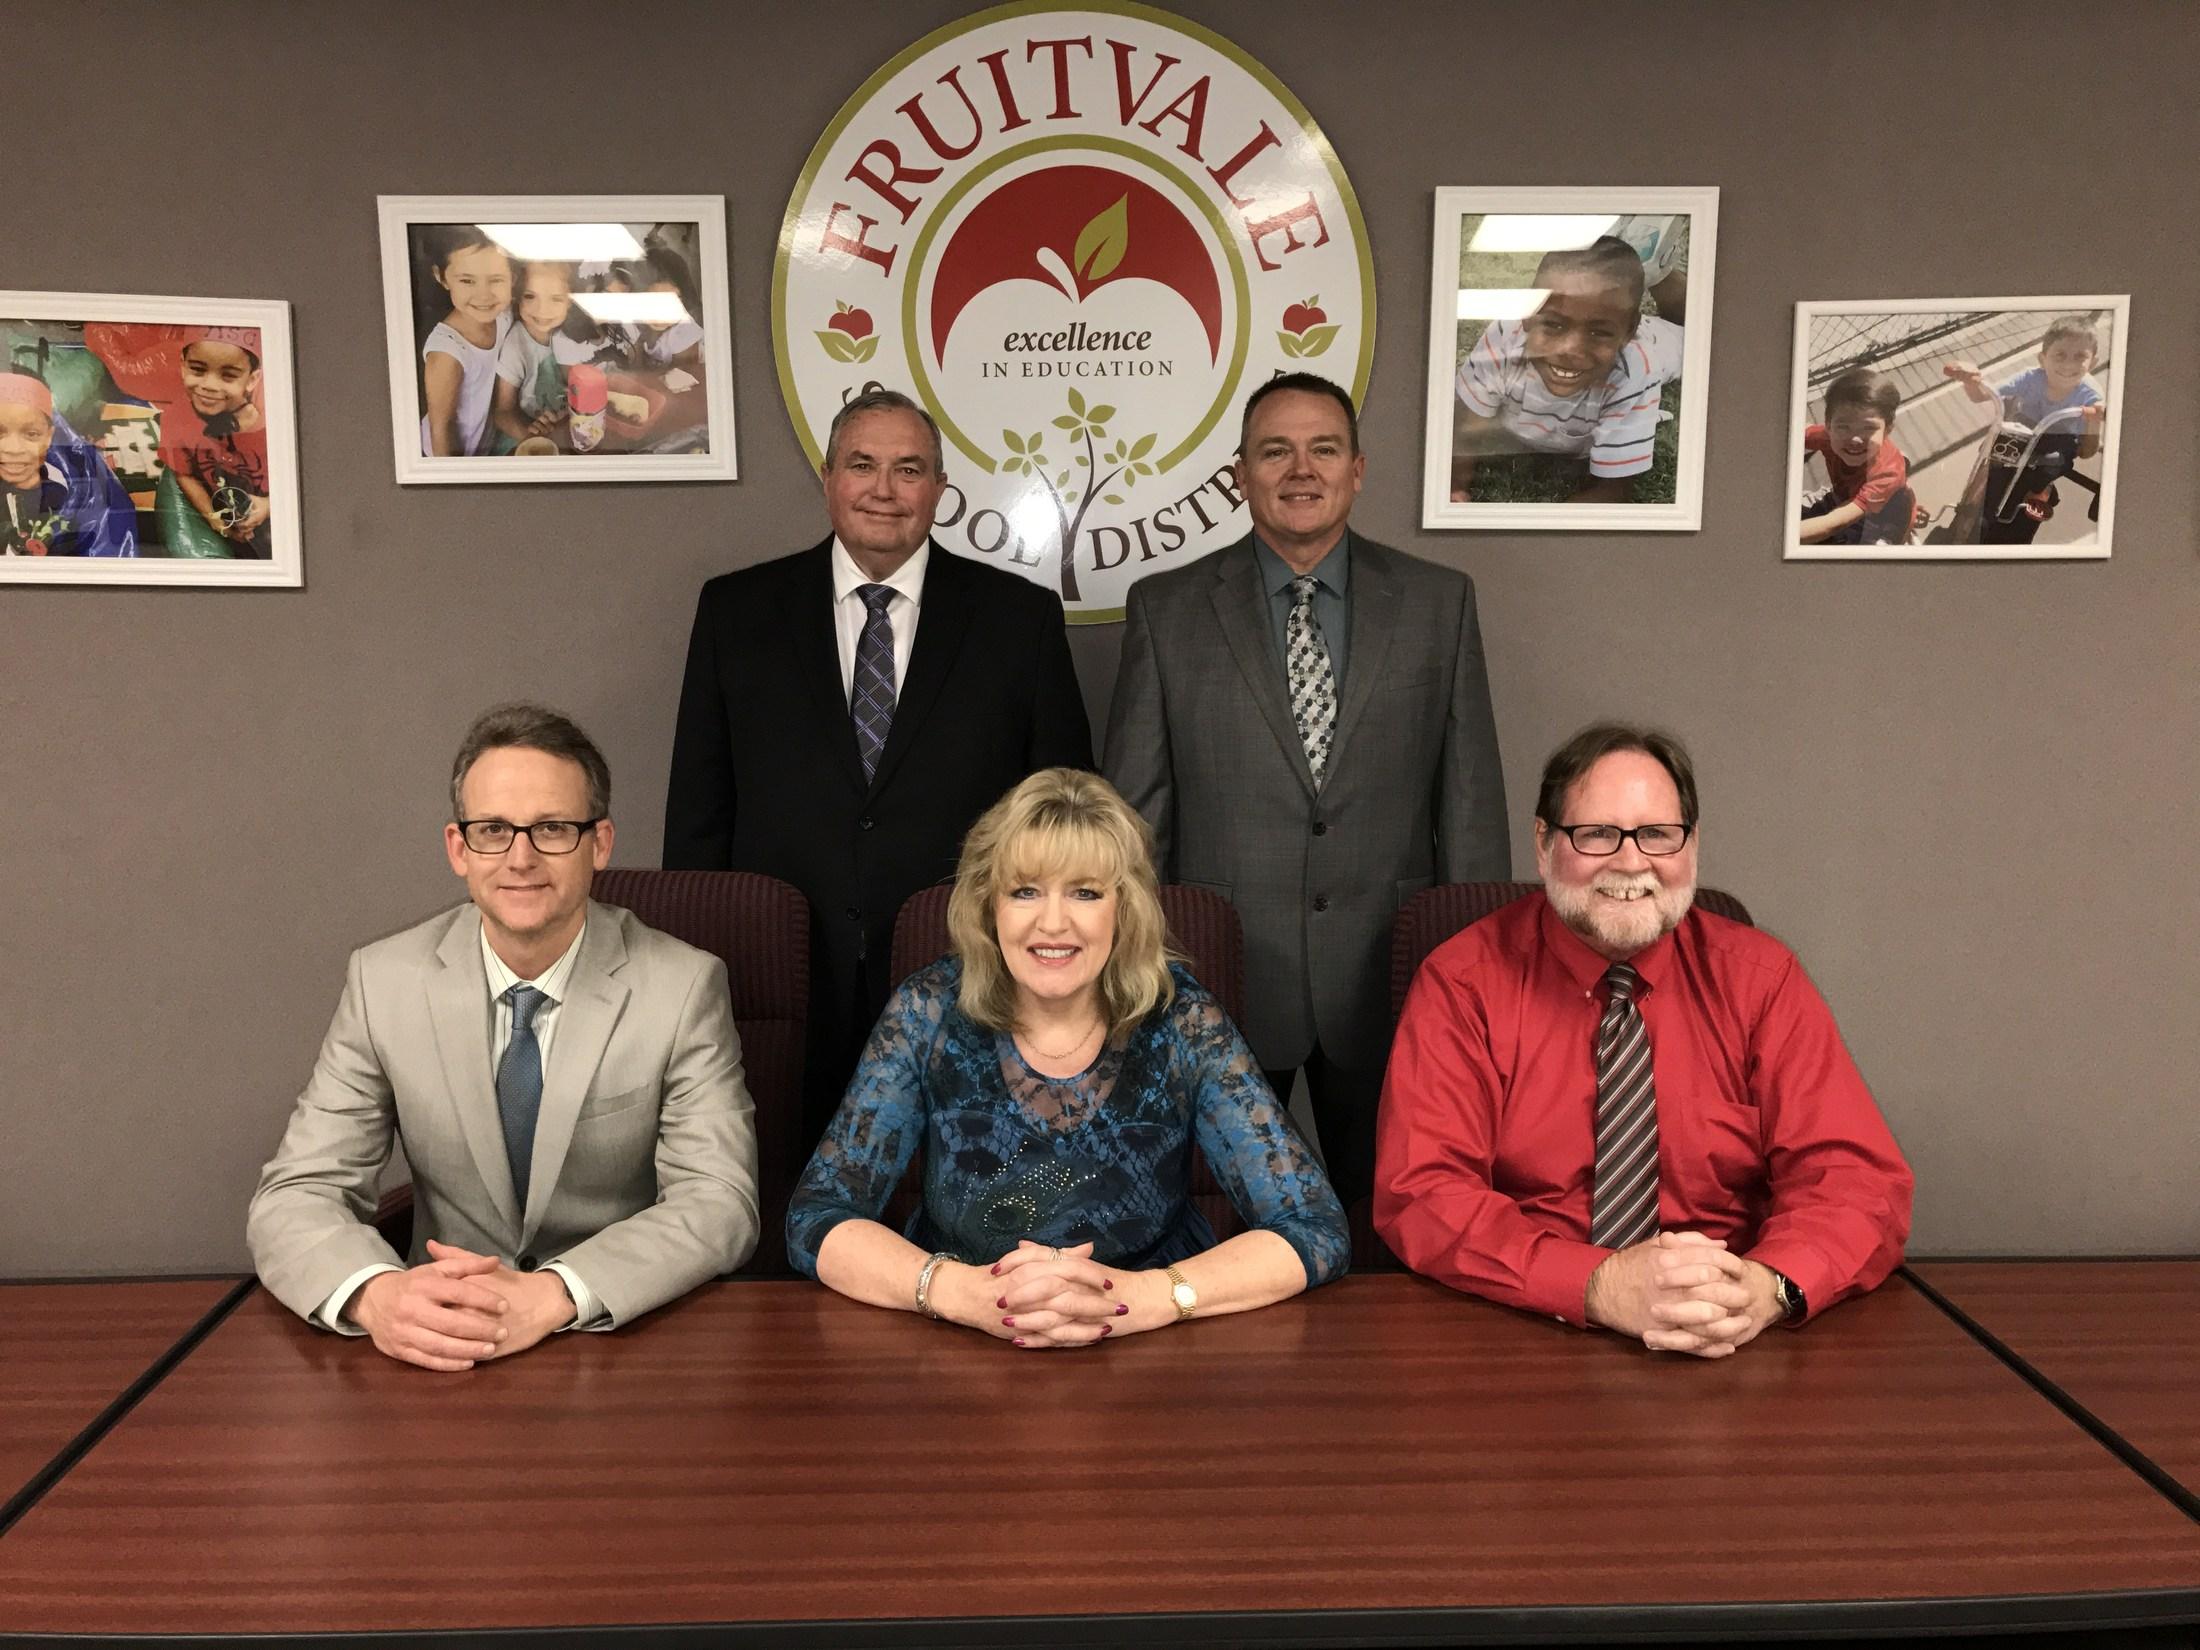 Tina Stout (Board President) Andrew Bransby (Board Clerk) Stan Greene (Board Member) Bill Jager (Board Member) Richard Traynor (Board Member)